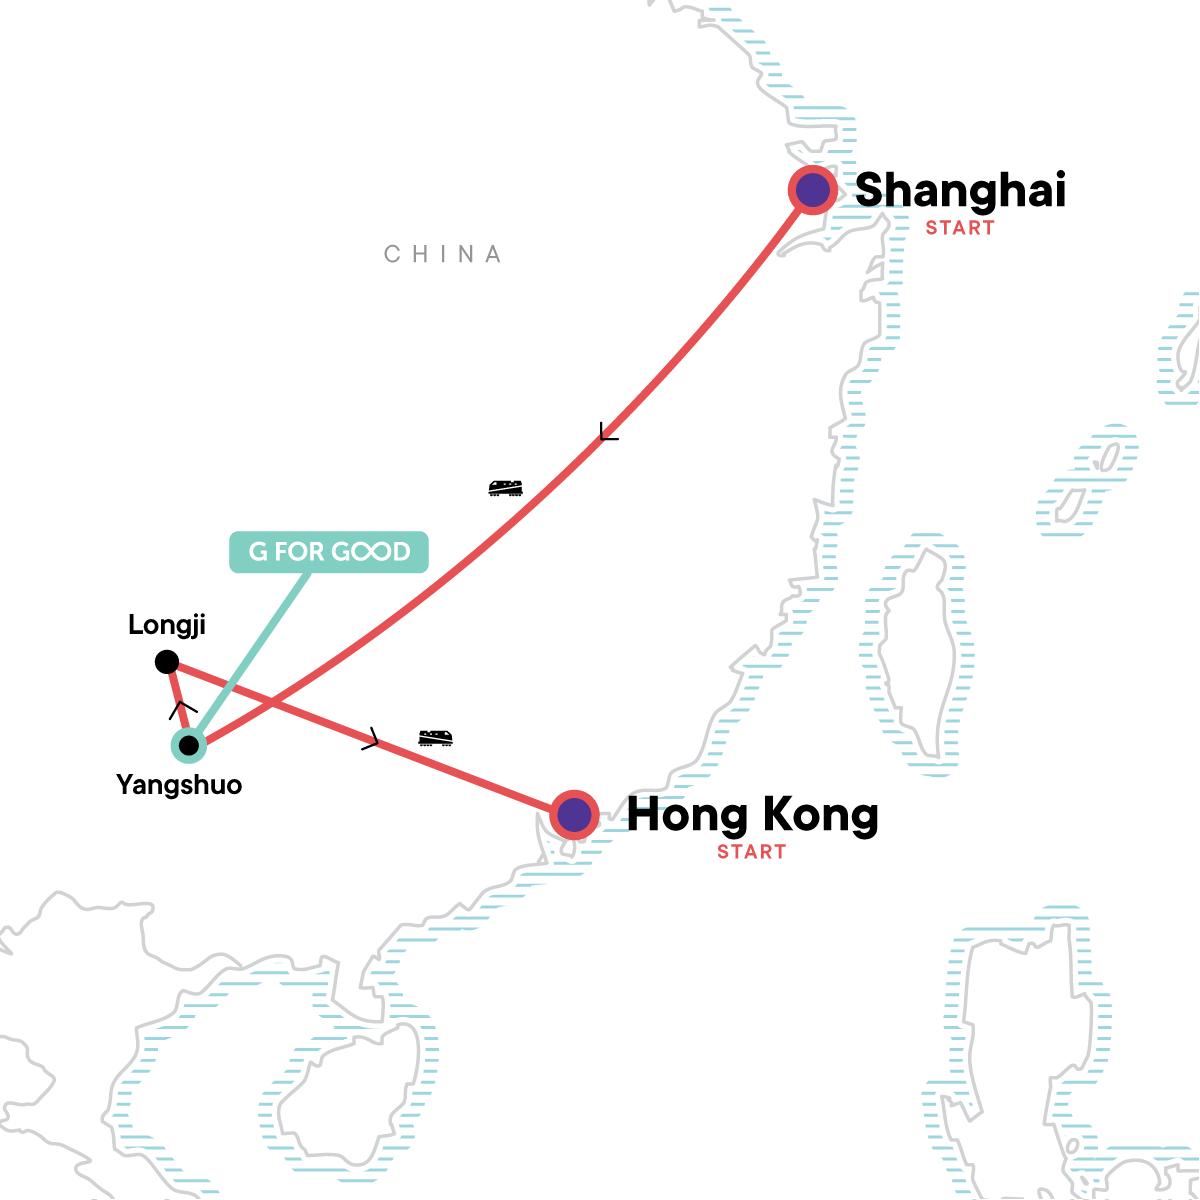 Classic Shanghai to Hong Kong Adventure Map